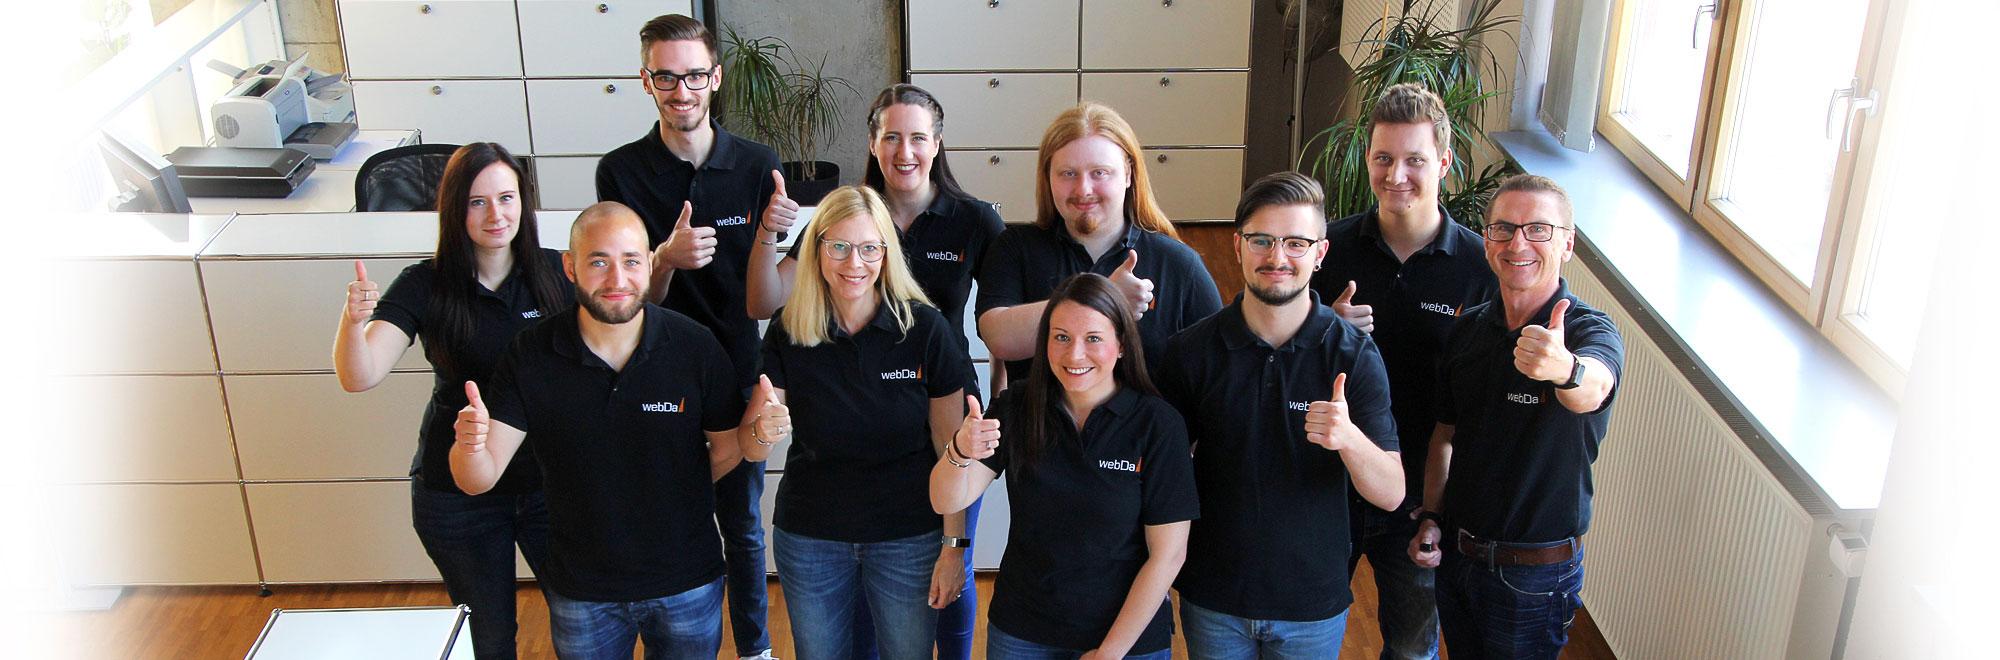 webDa Team